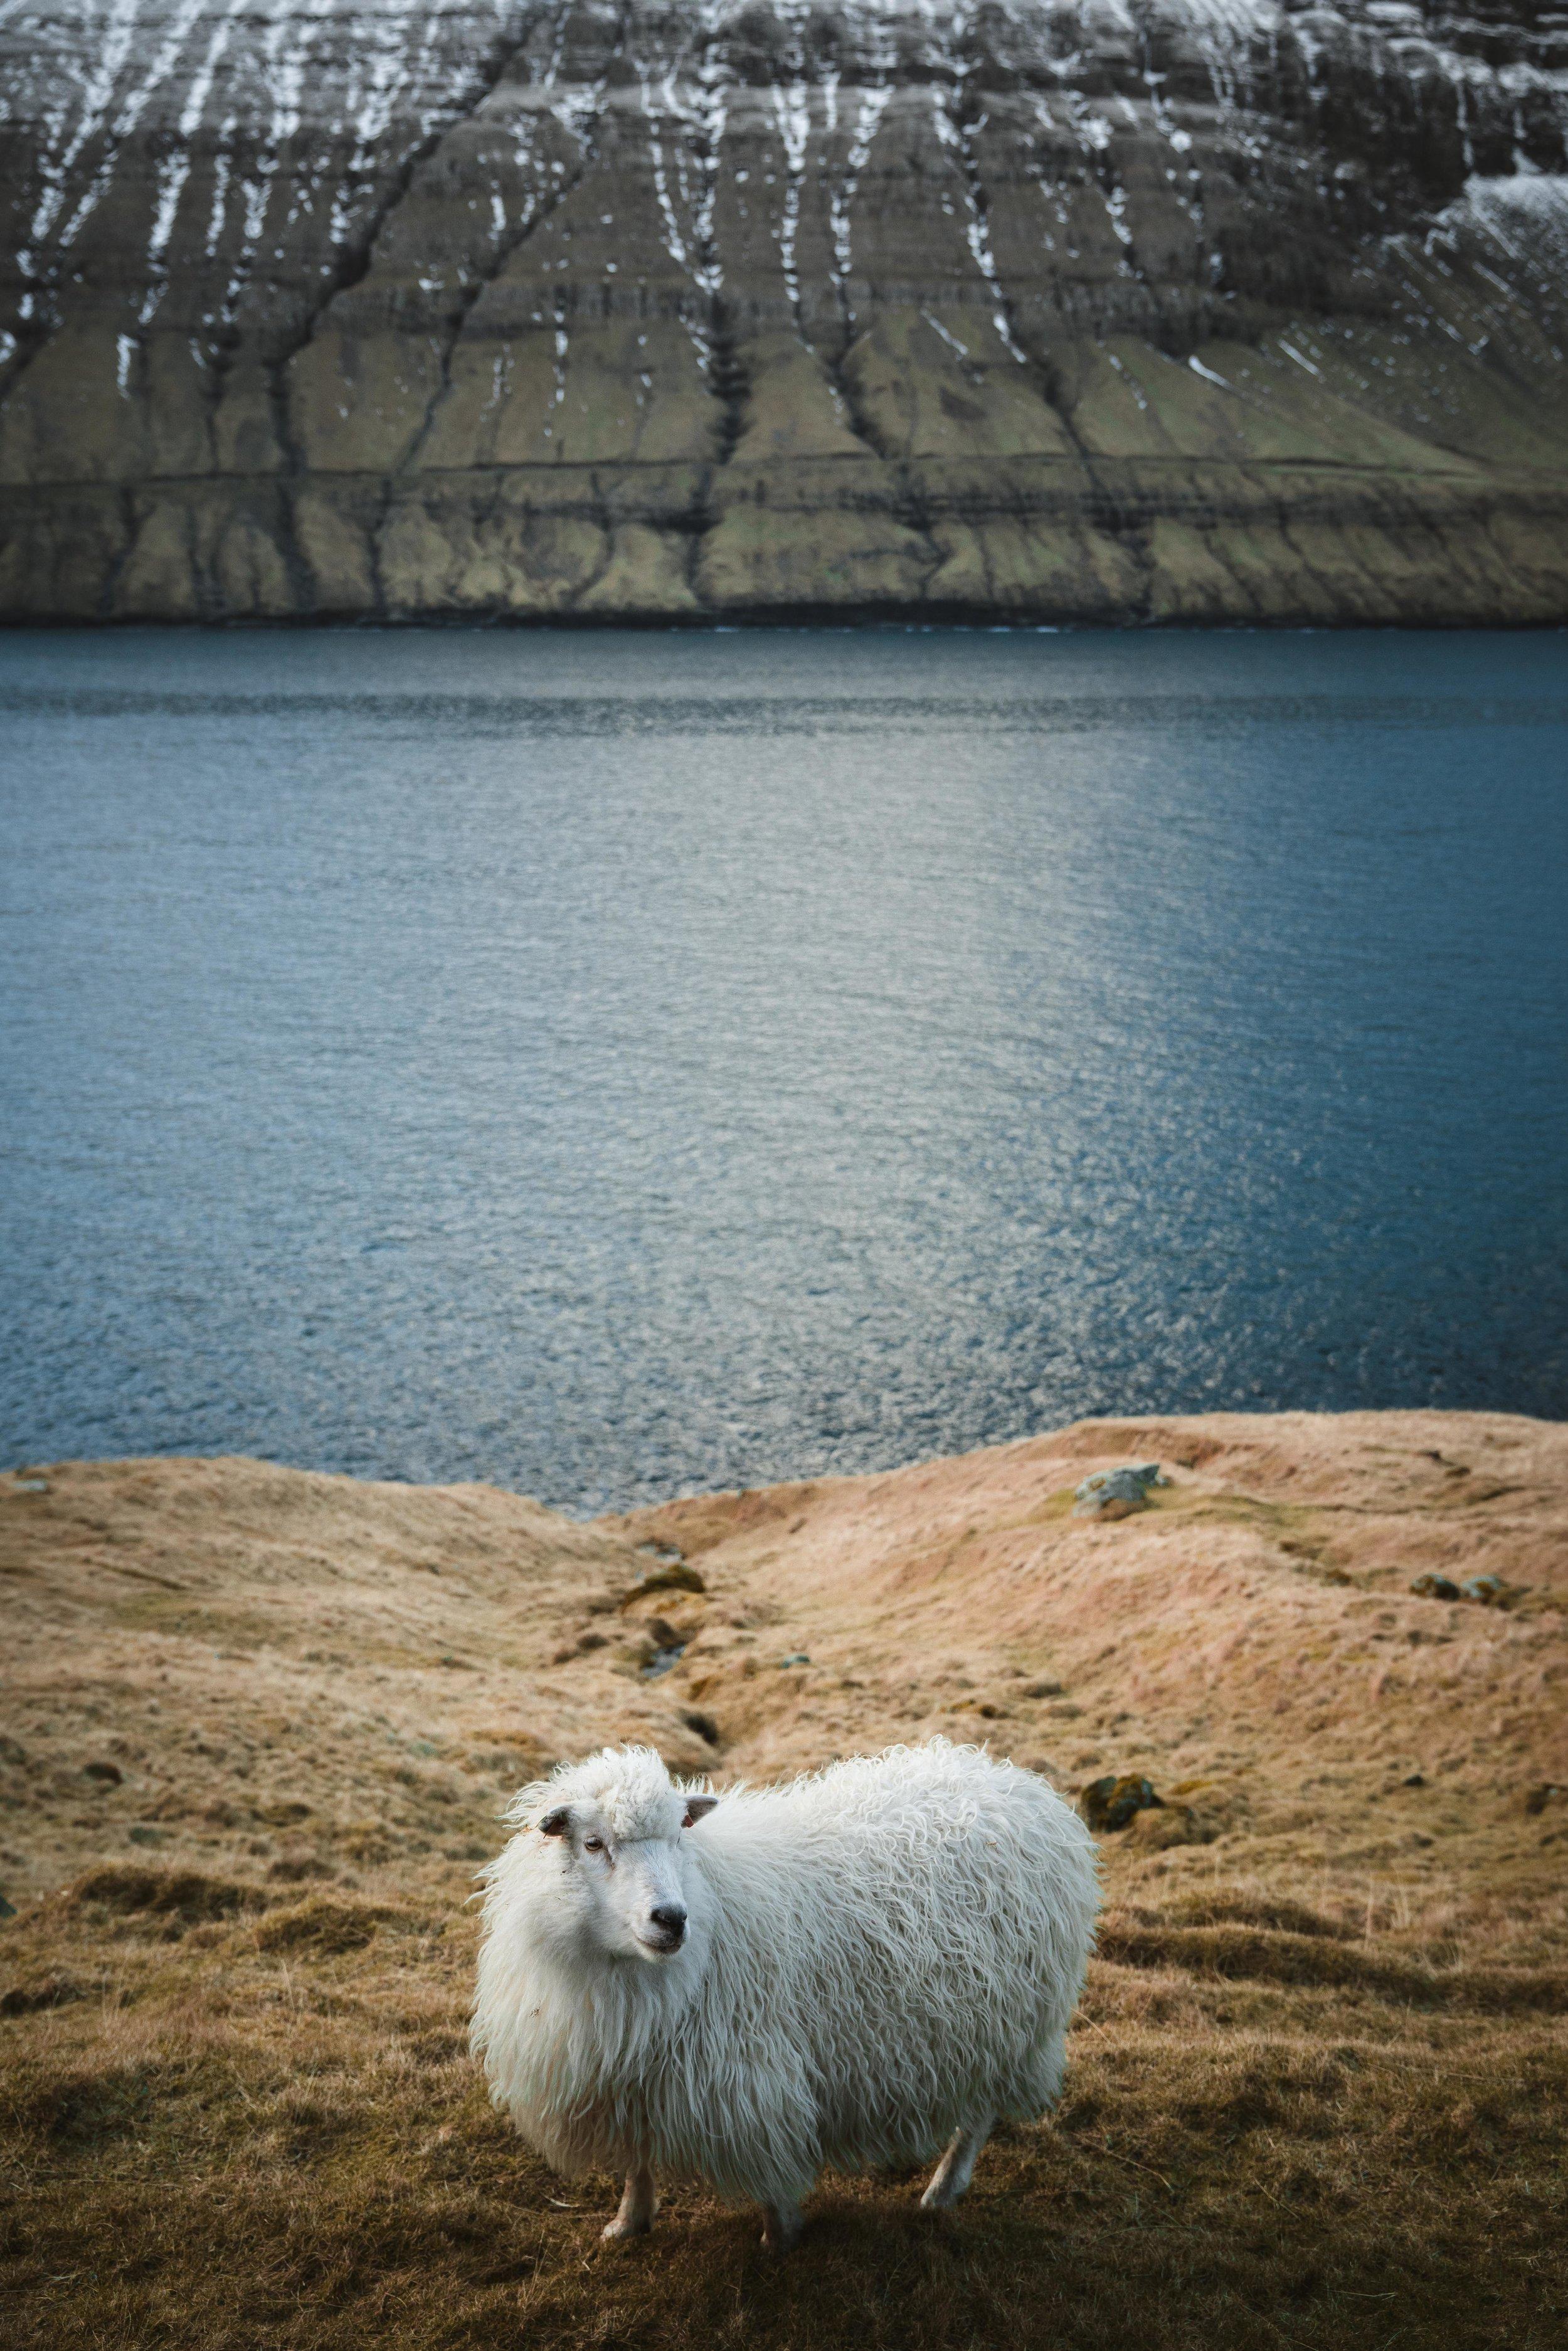 White Sheep in the Fjord_Feb 5.jpg